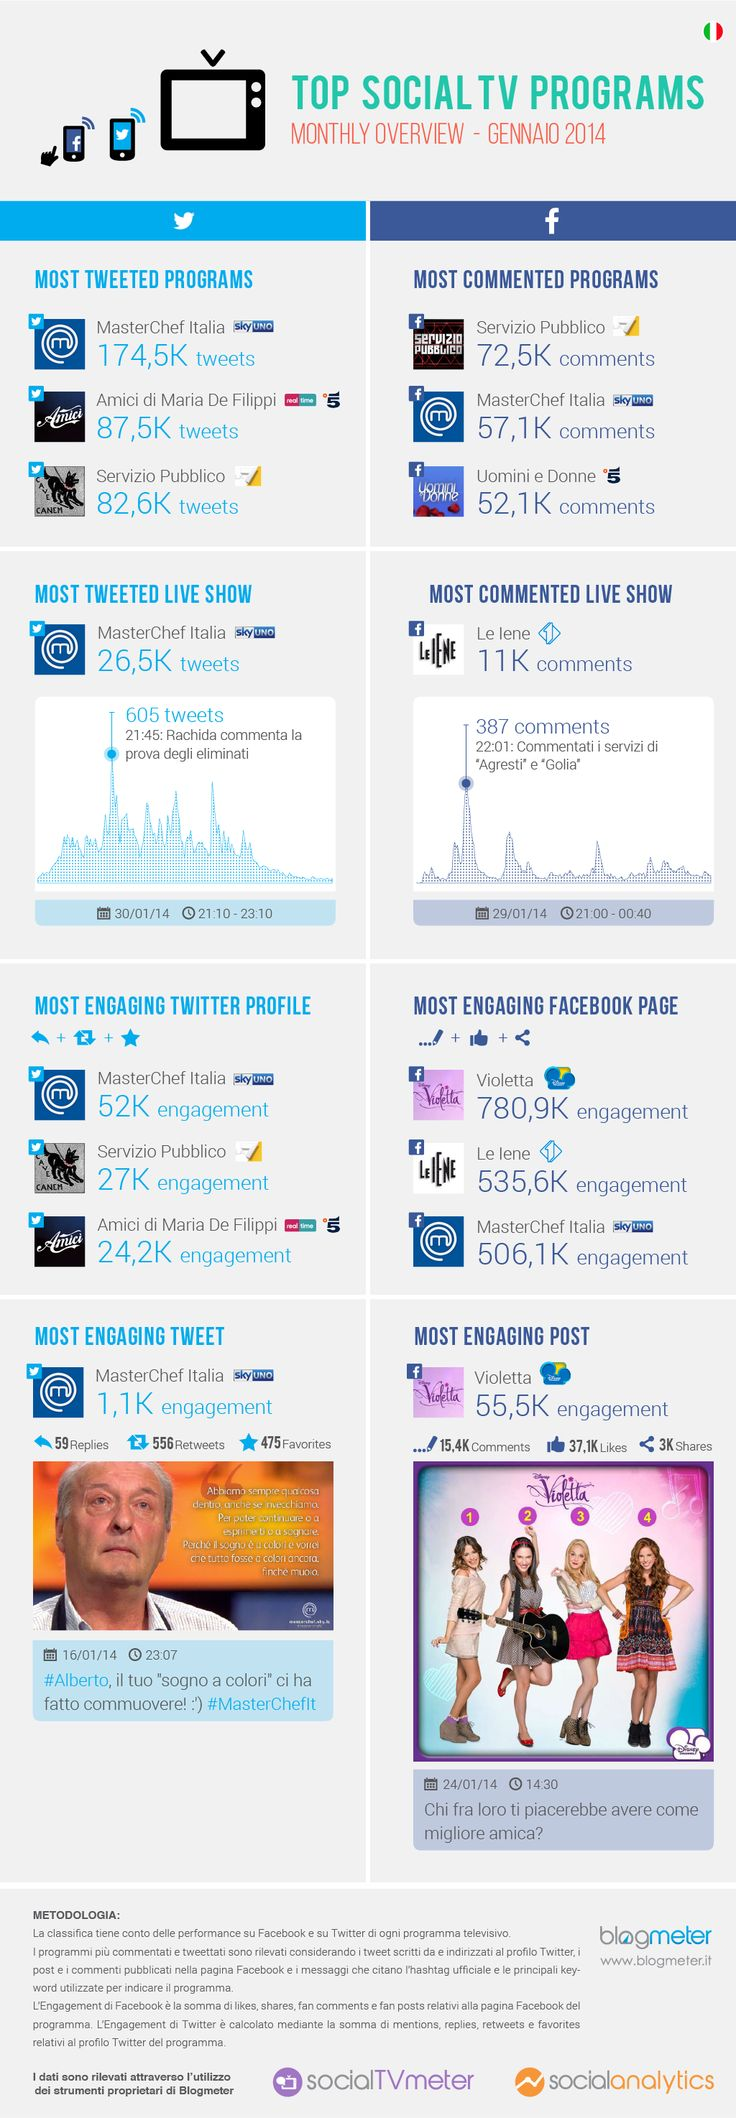 Top Social TV Programs gennaio 2014